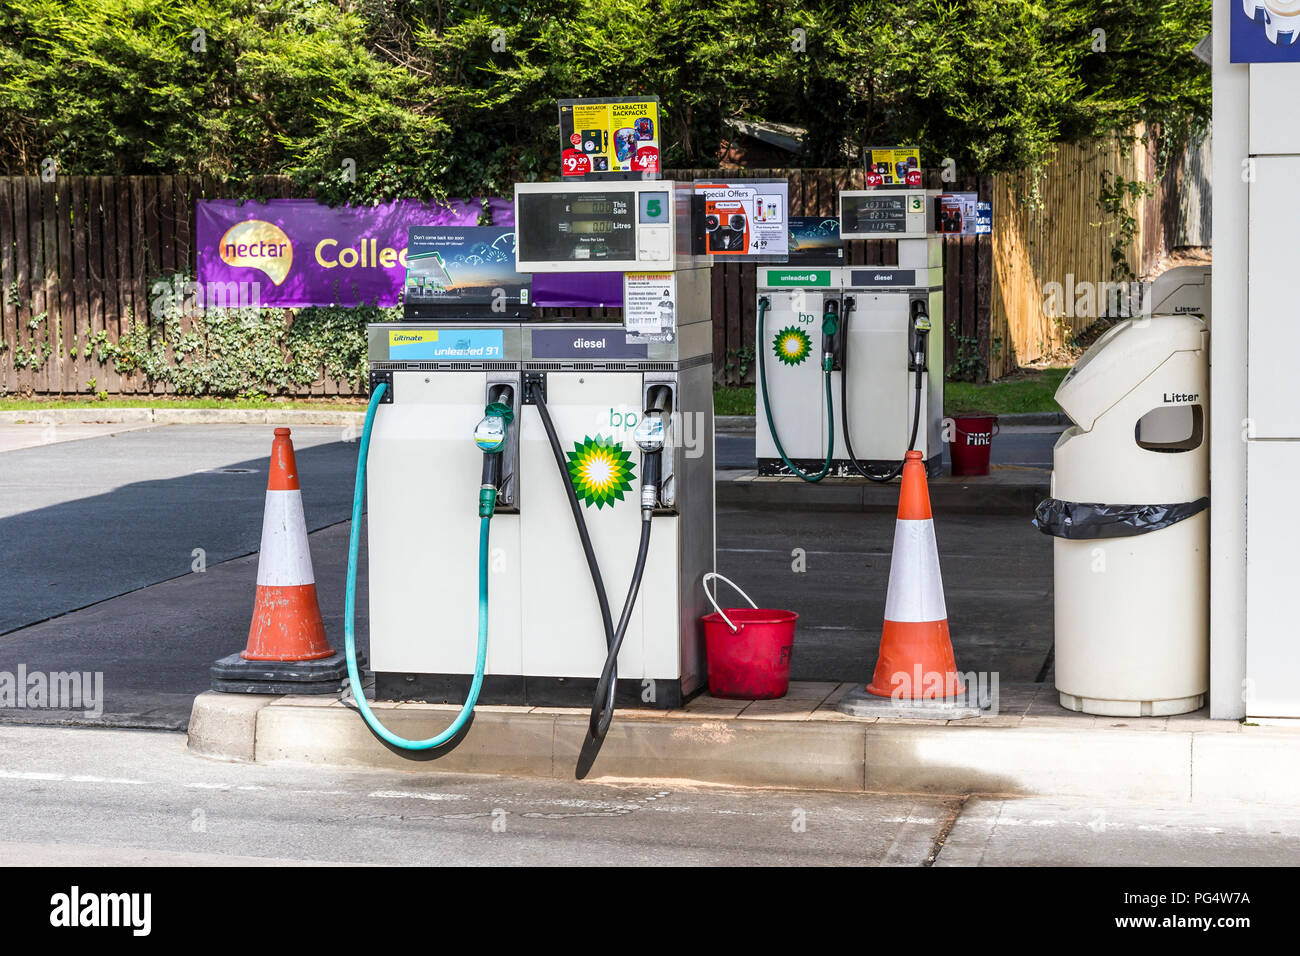 BP petrol pump at fuel station - Stock Image